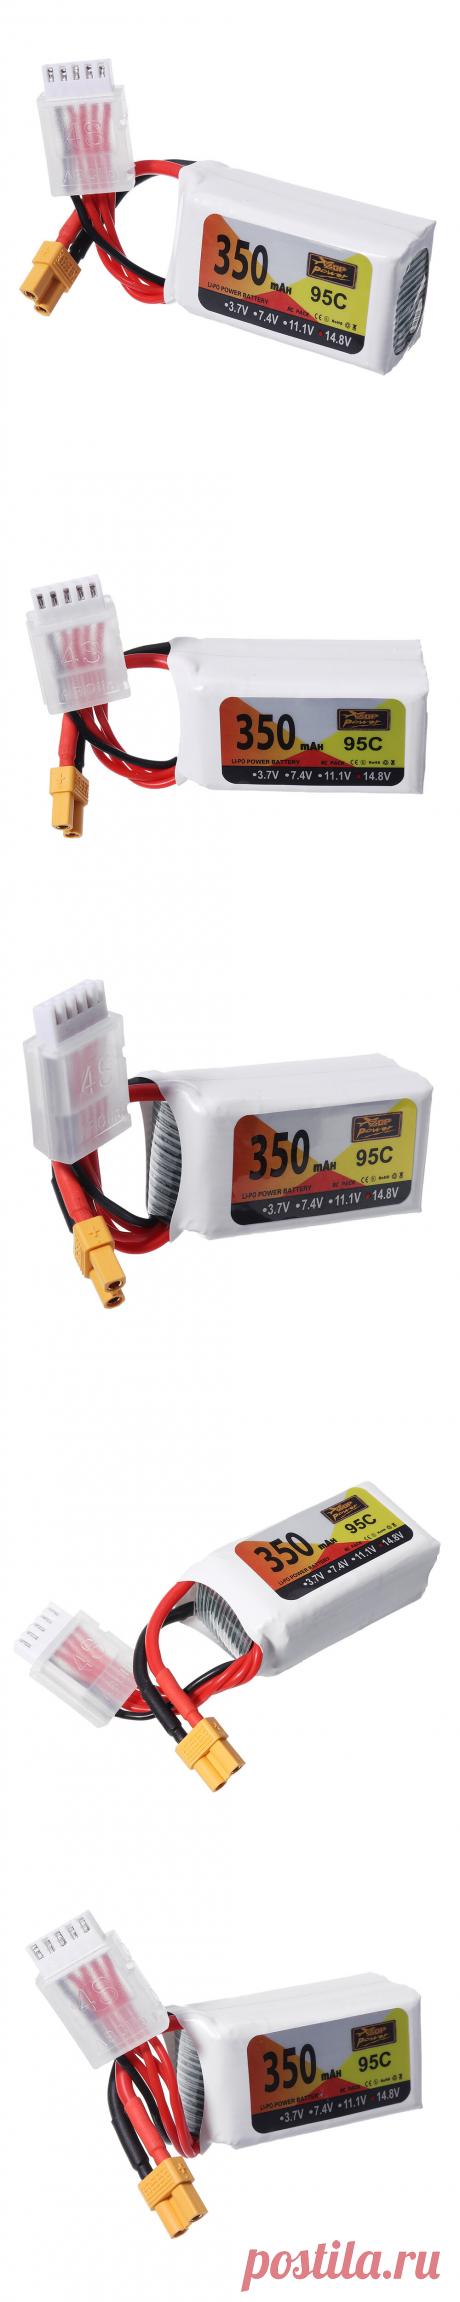 zop power 14.8v 350mah 95c 4s lipo battery xt30 plug for rc drone Sale - Banggood.com